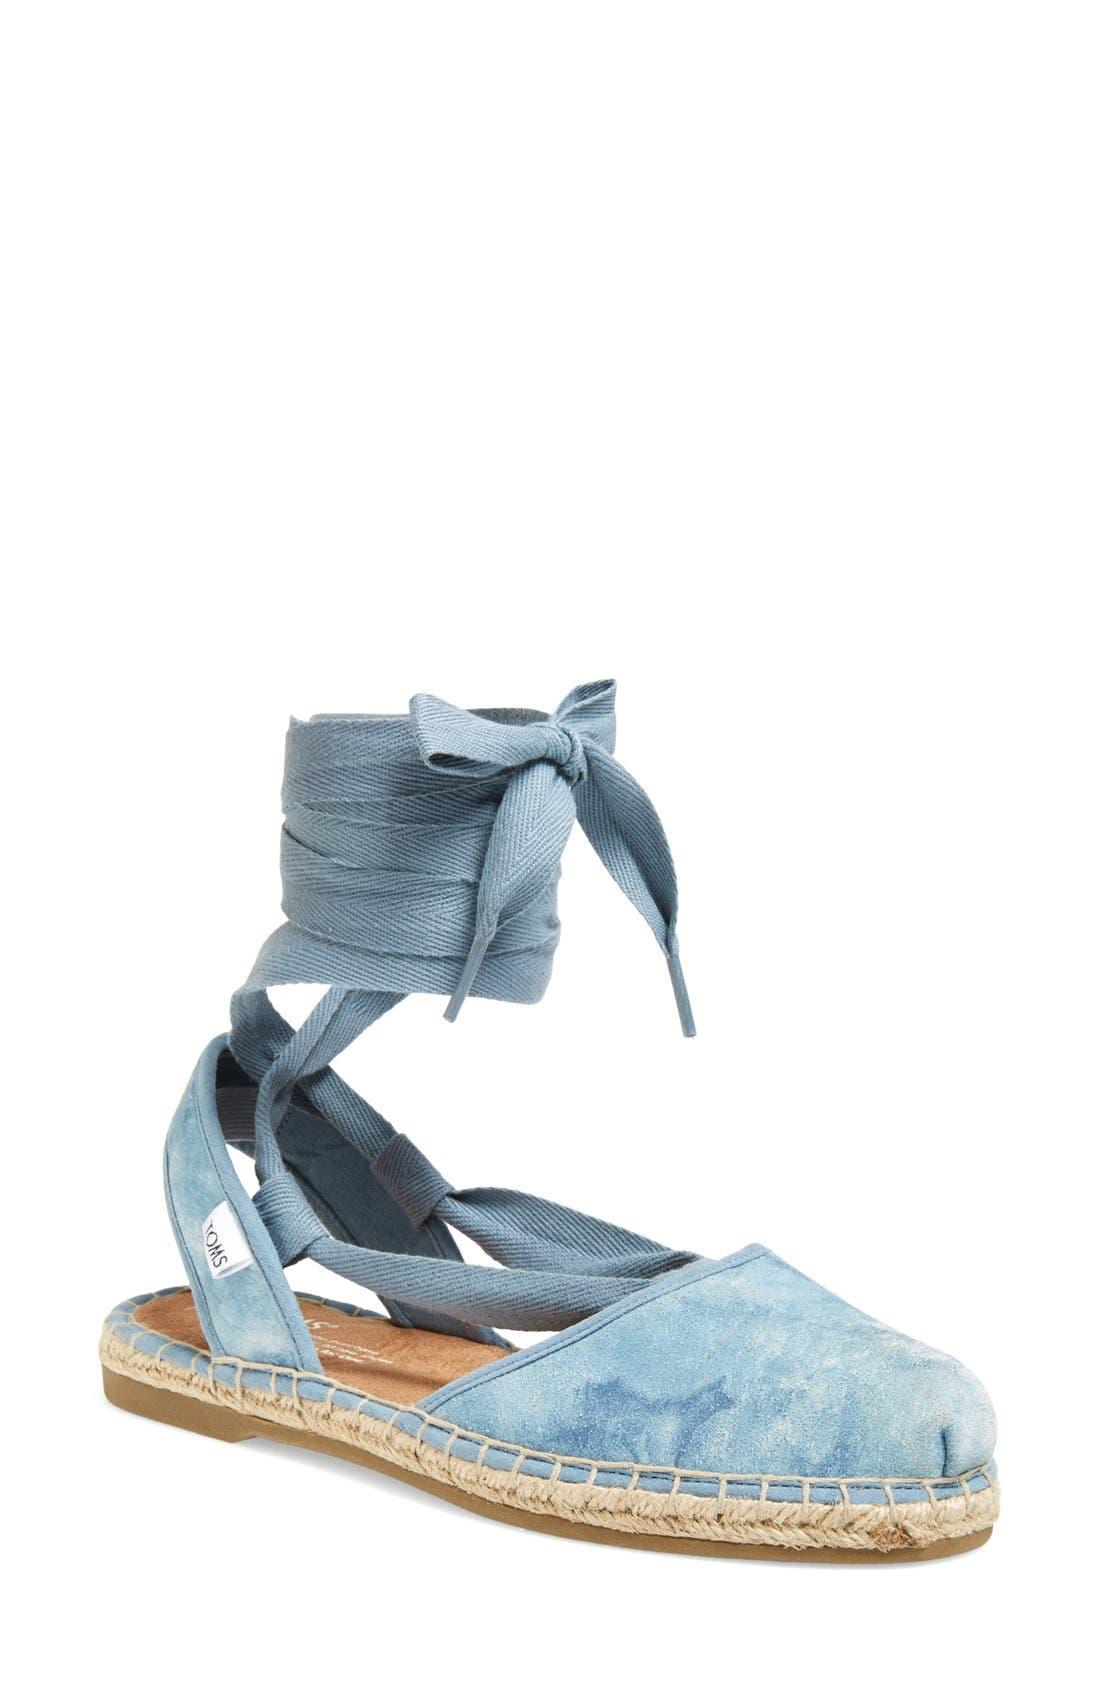 Main Image - TOMS 'Bella' Washed Suede Lace-Up Espadrille Sandal (Women)